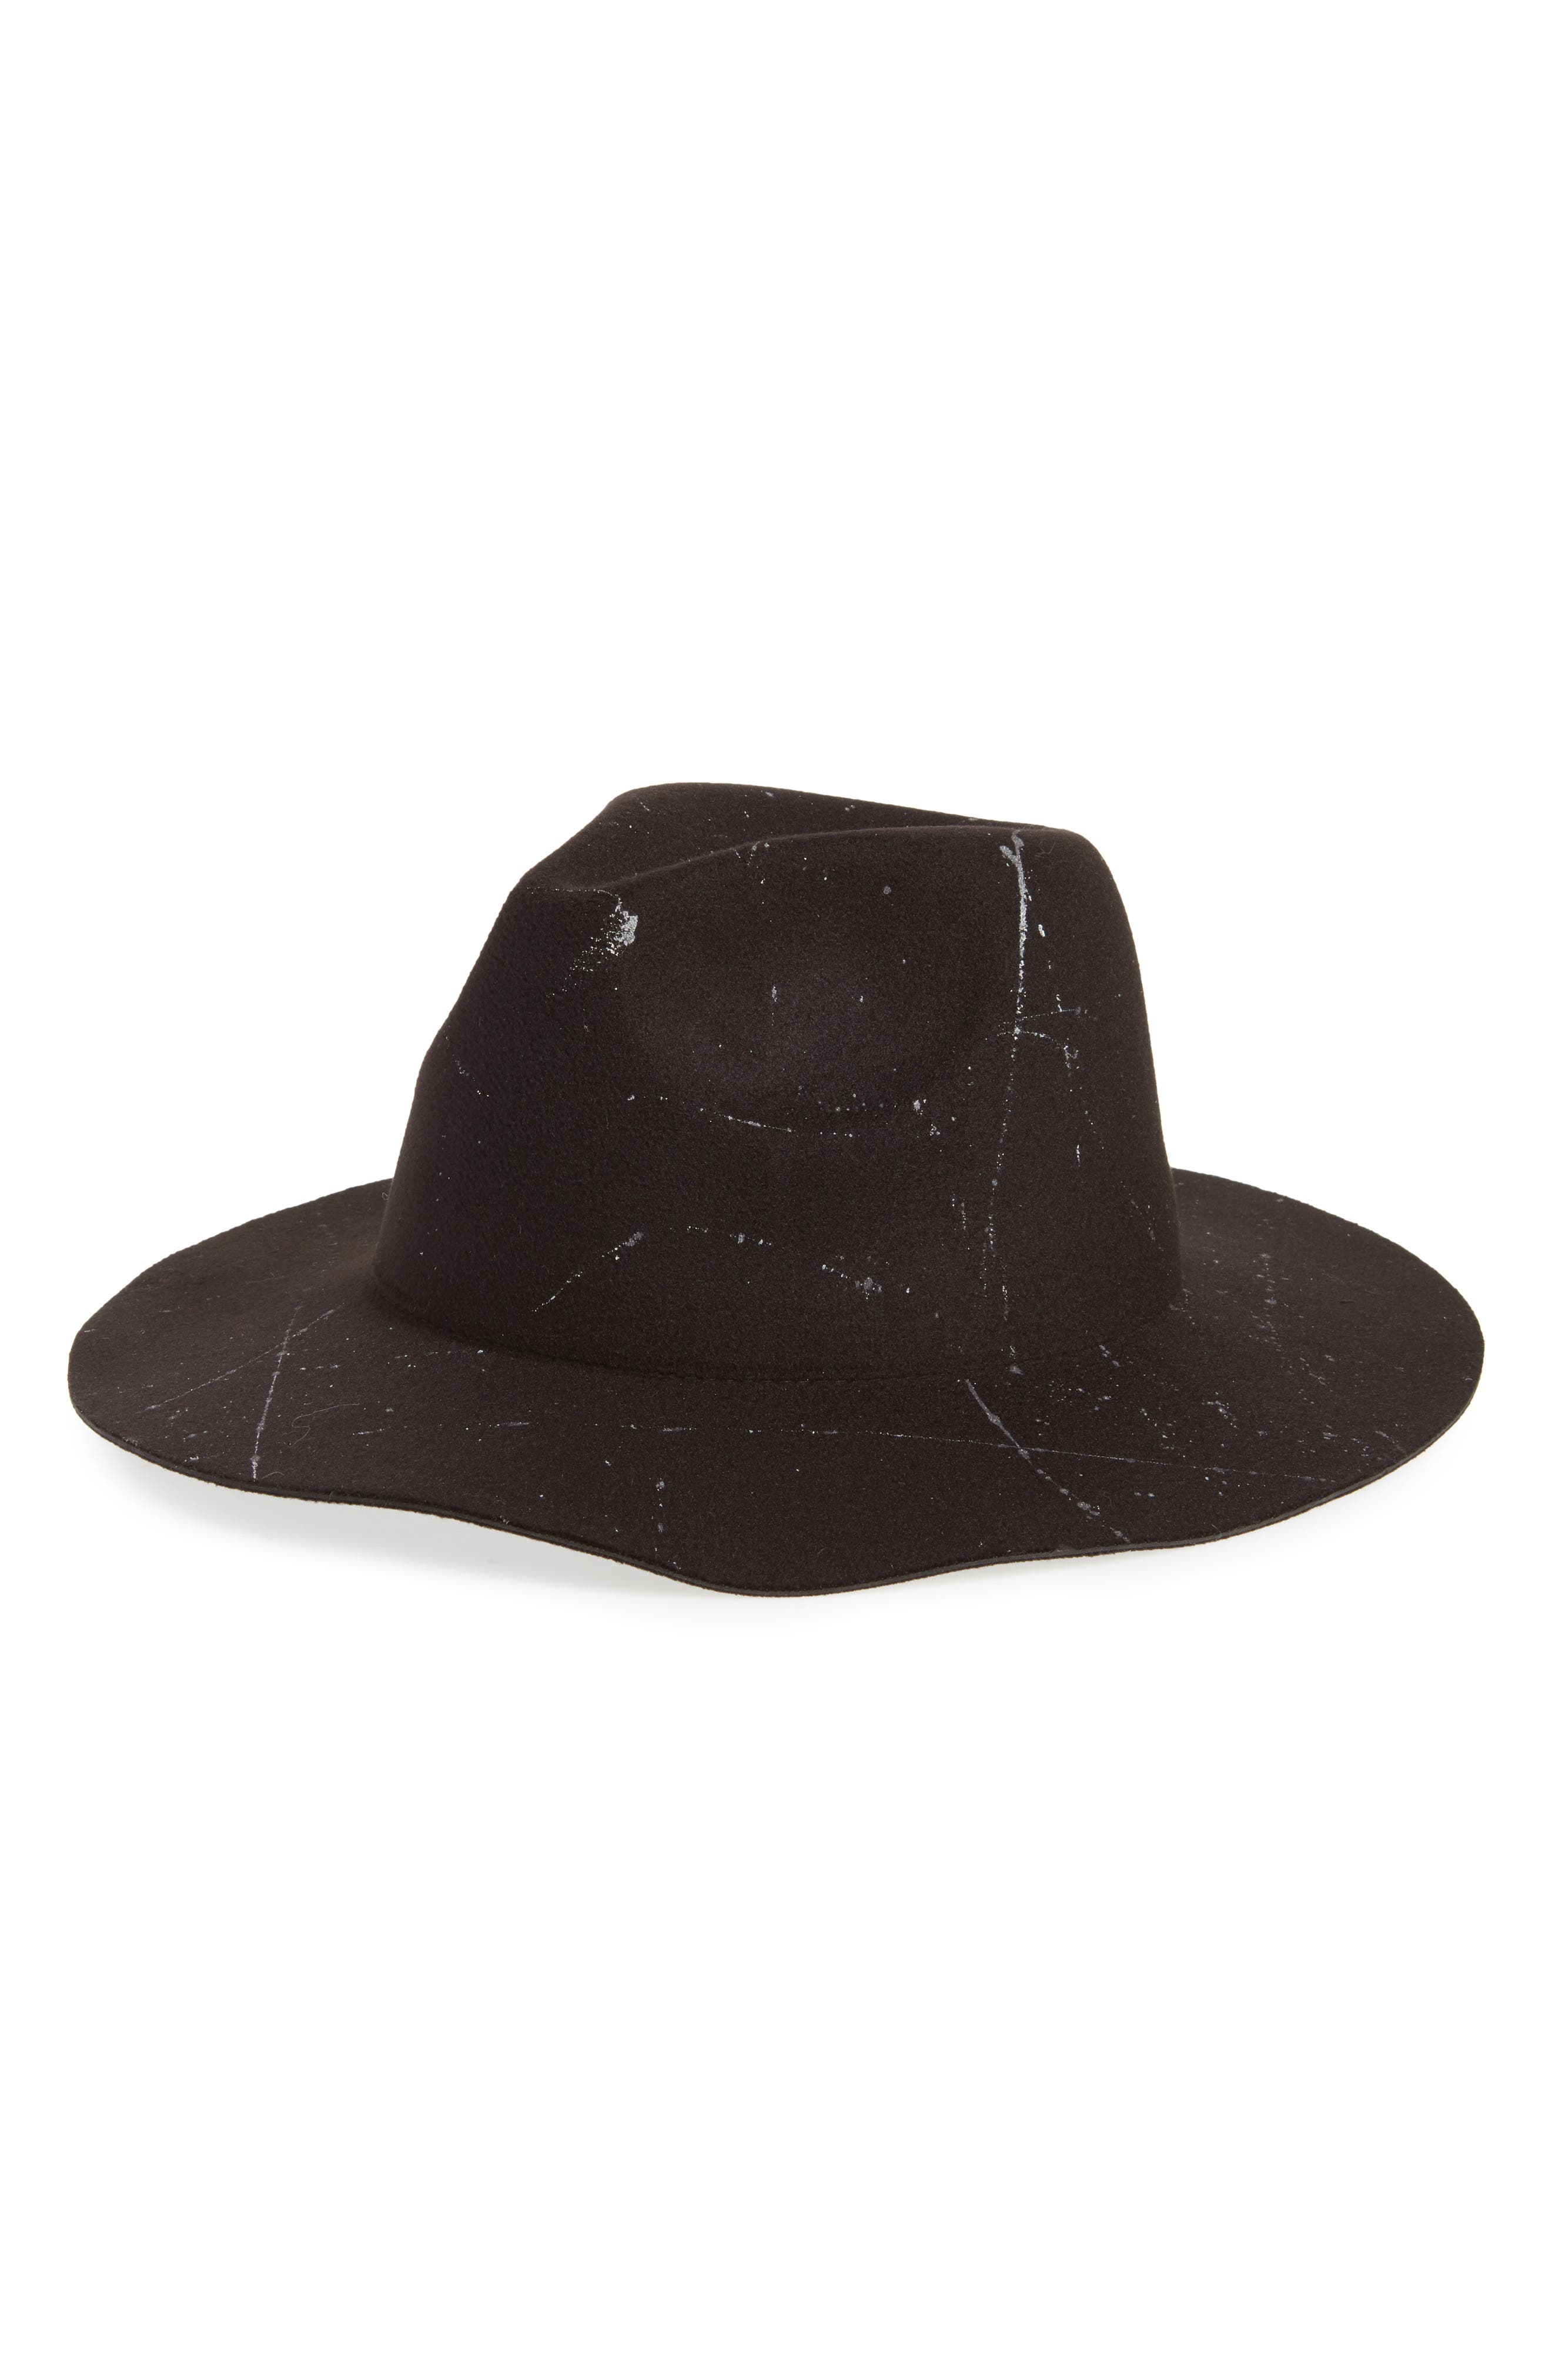 Kitsch Marbled Paint Felt Panama Hat